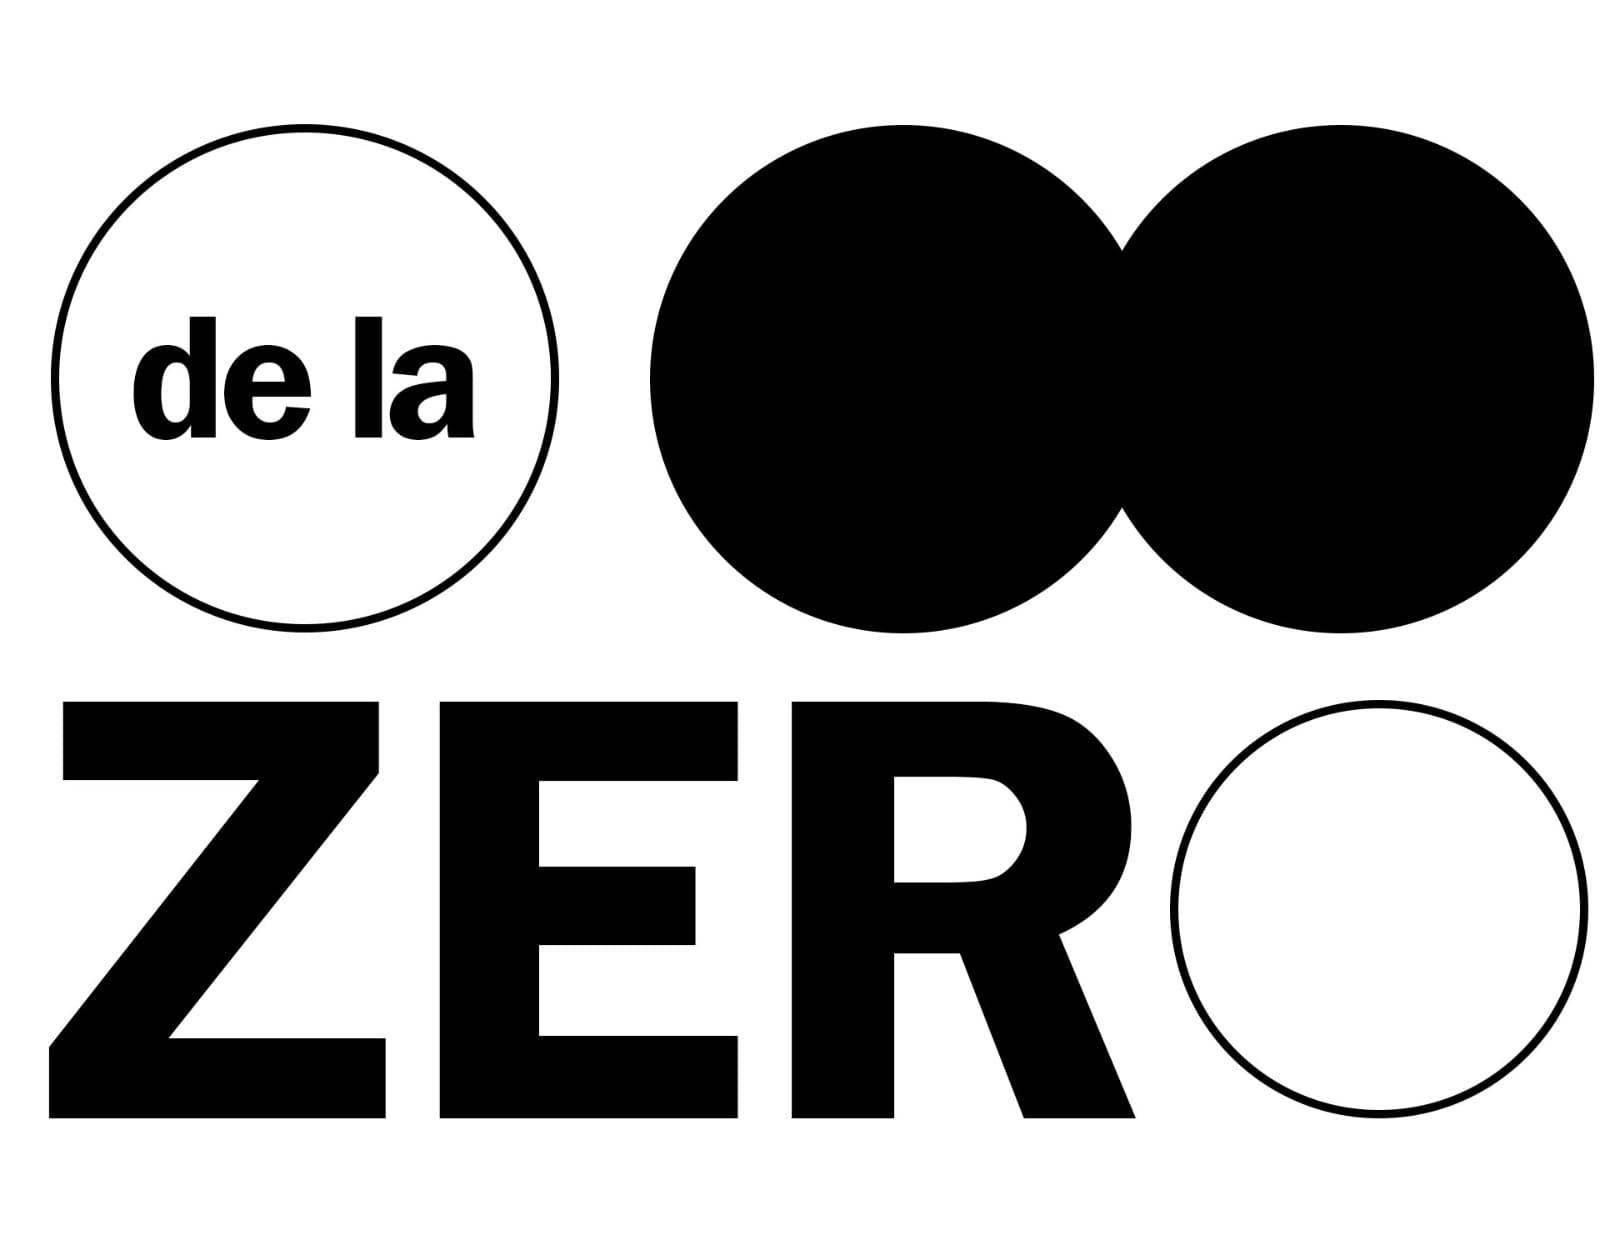 ASOCIATIA DELAZERO logo